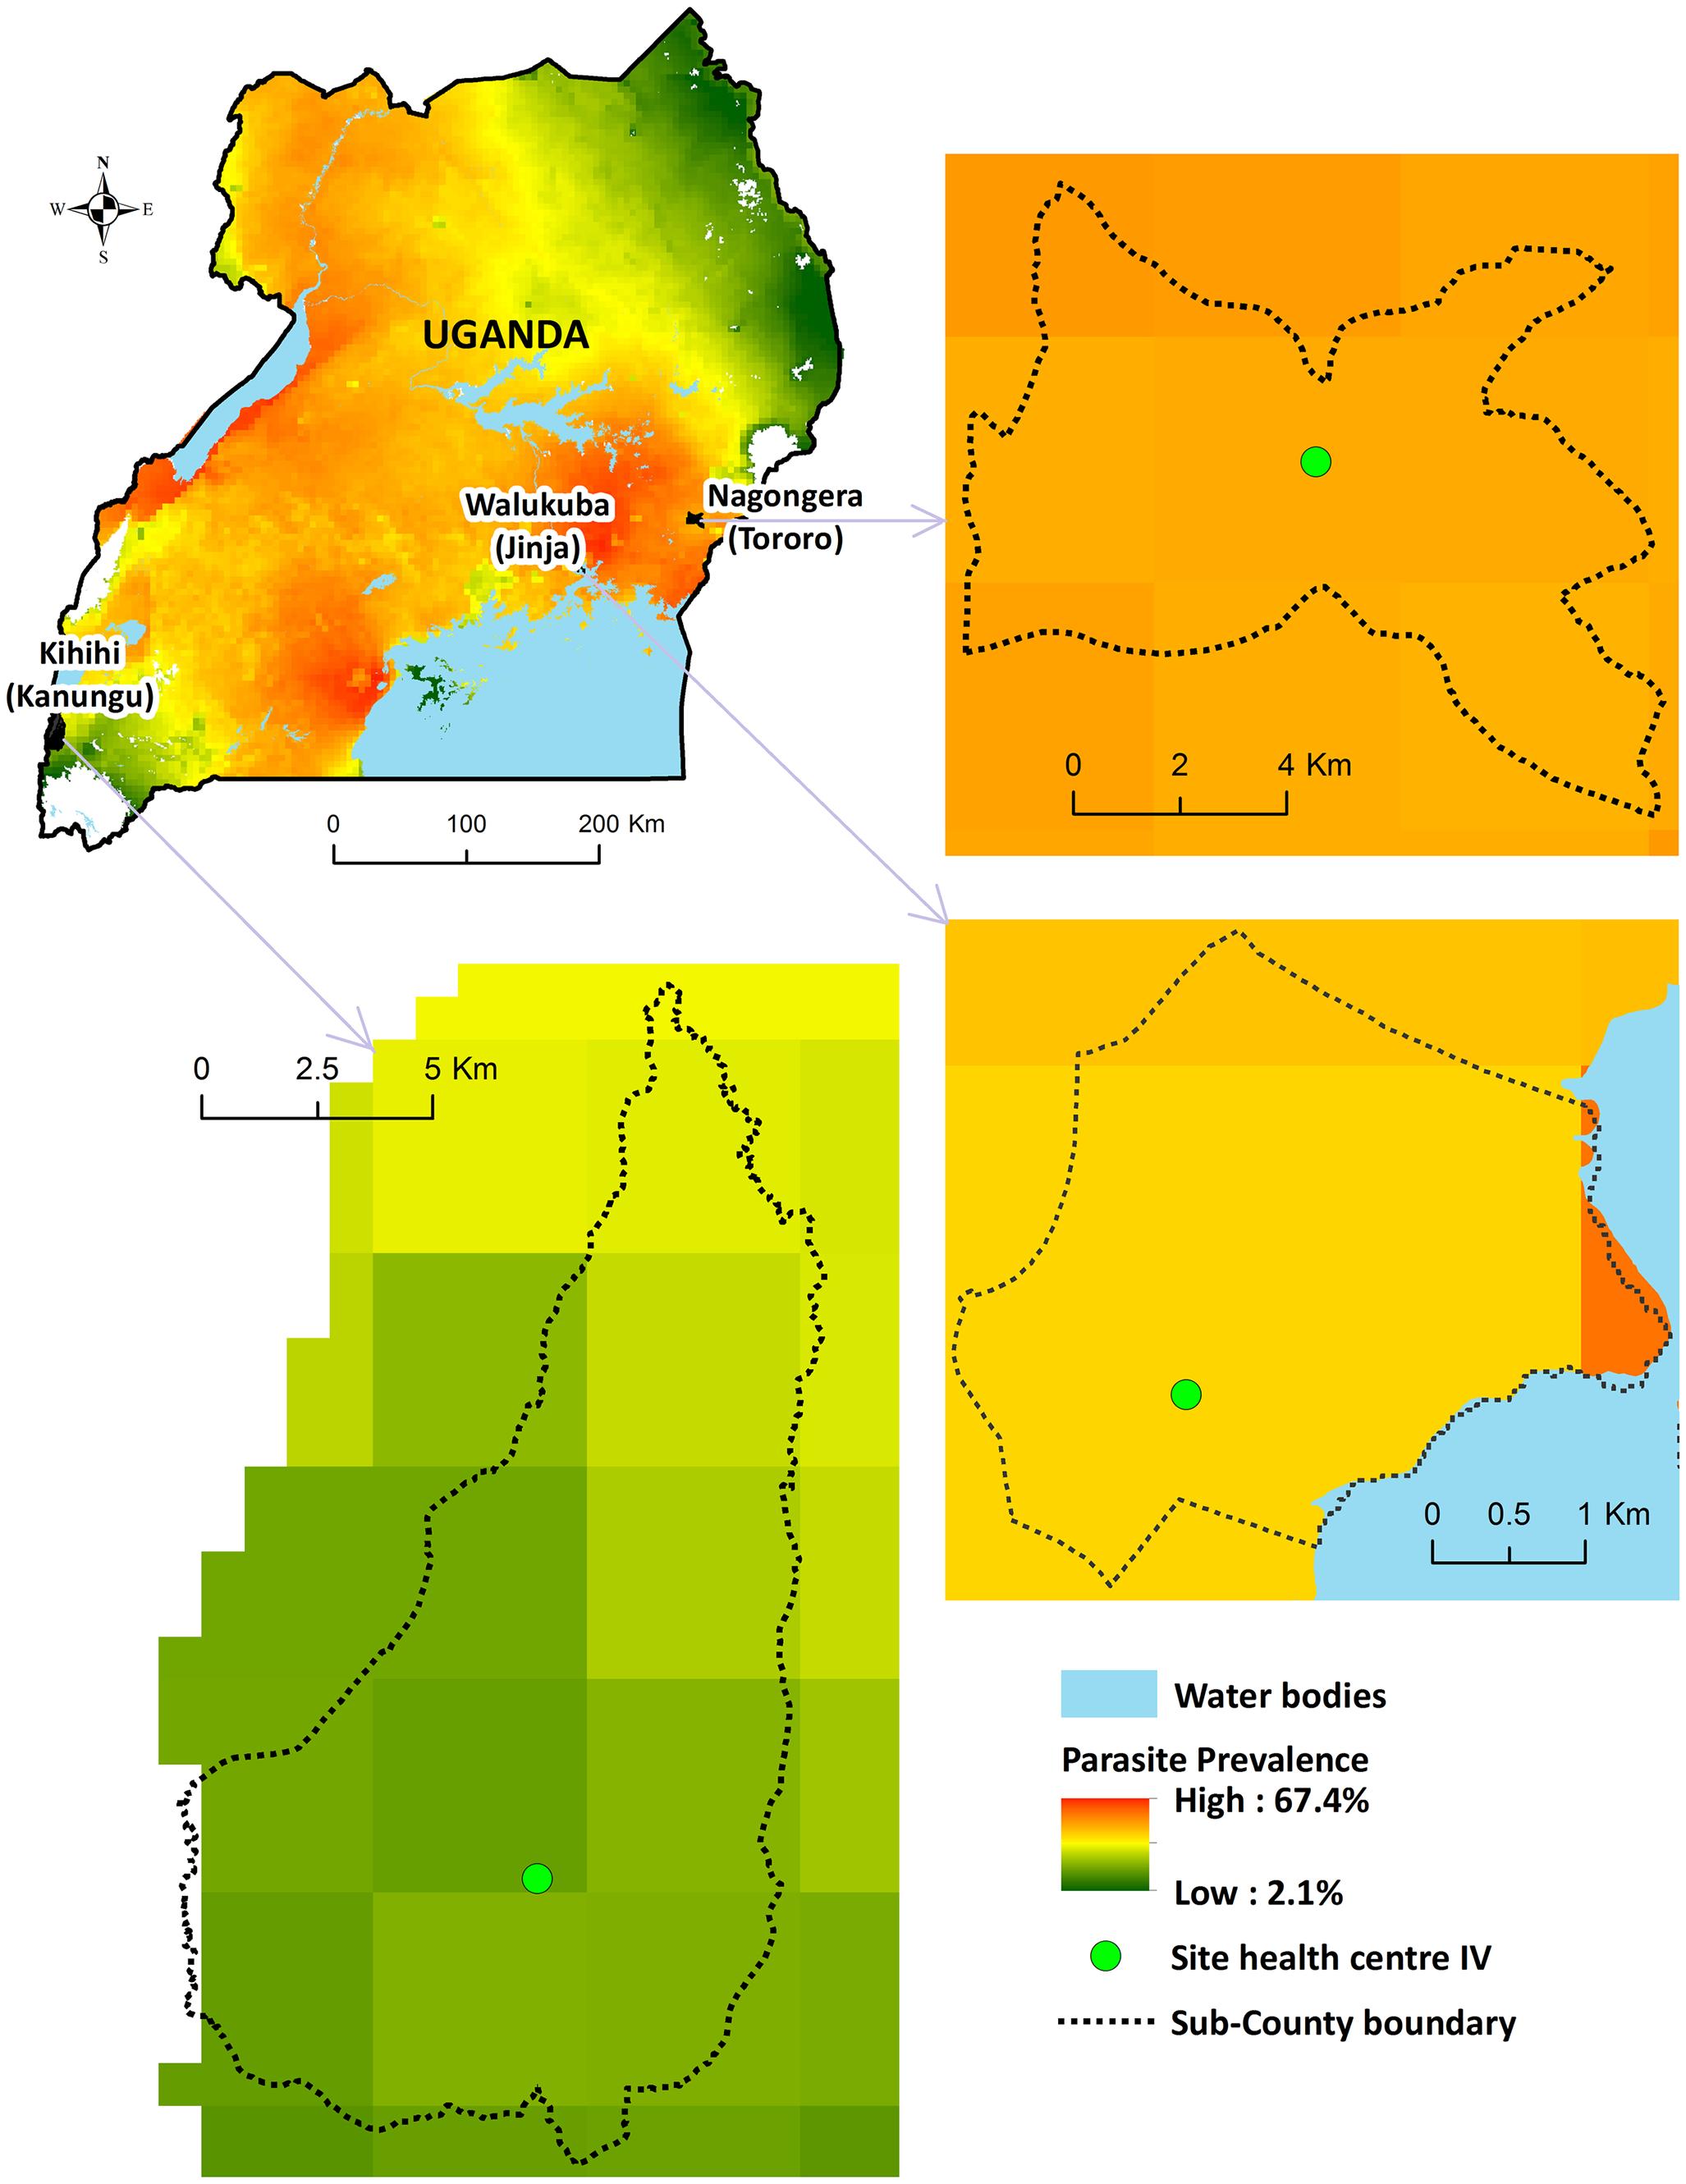 Map of Uganda showing study sites.